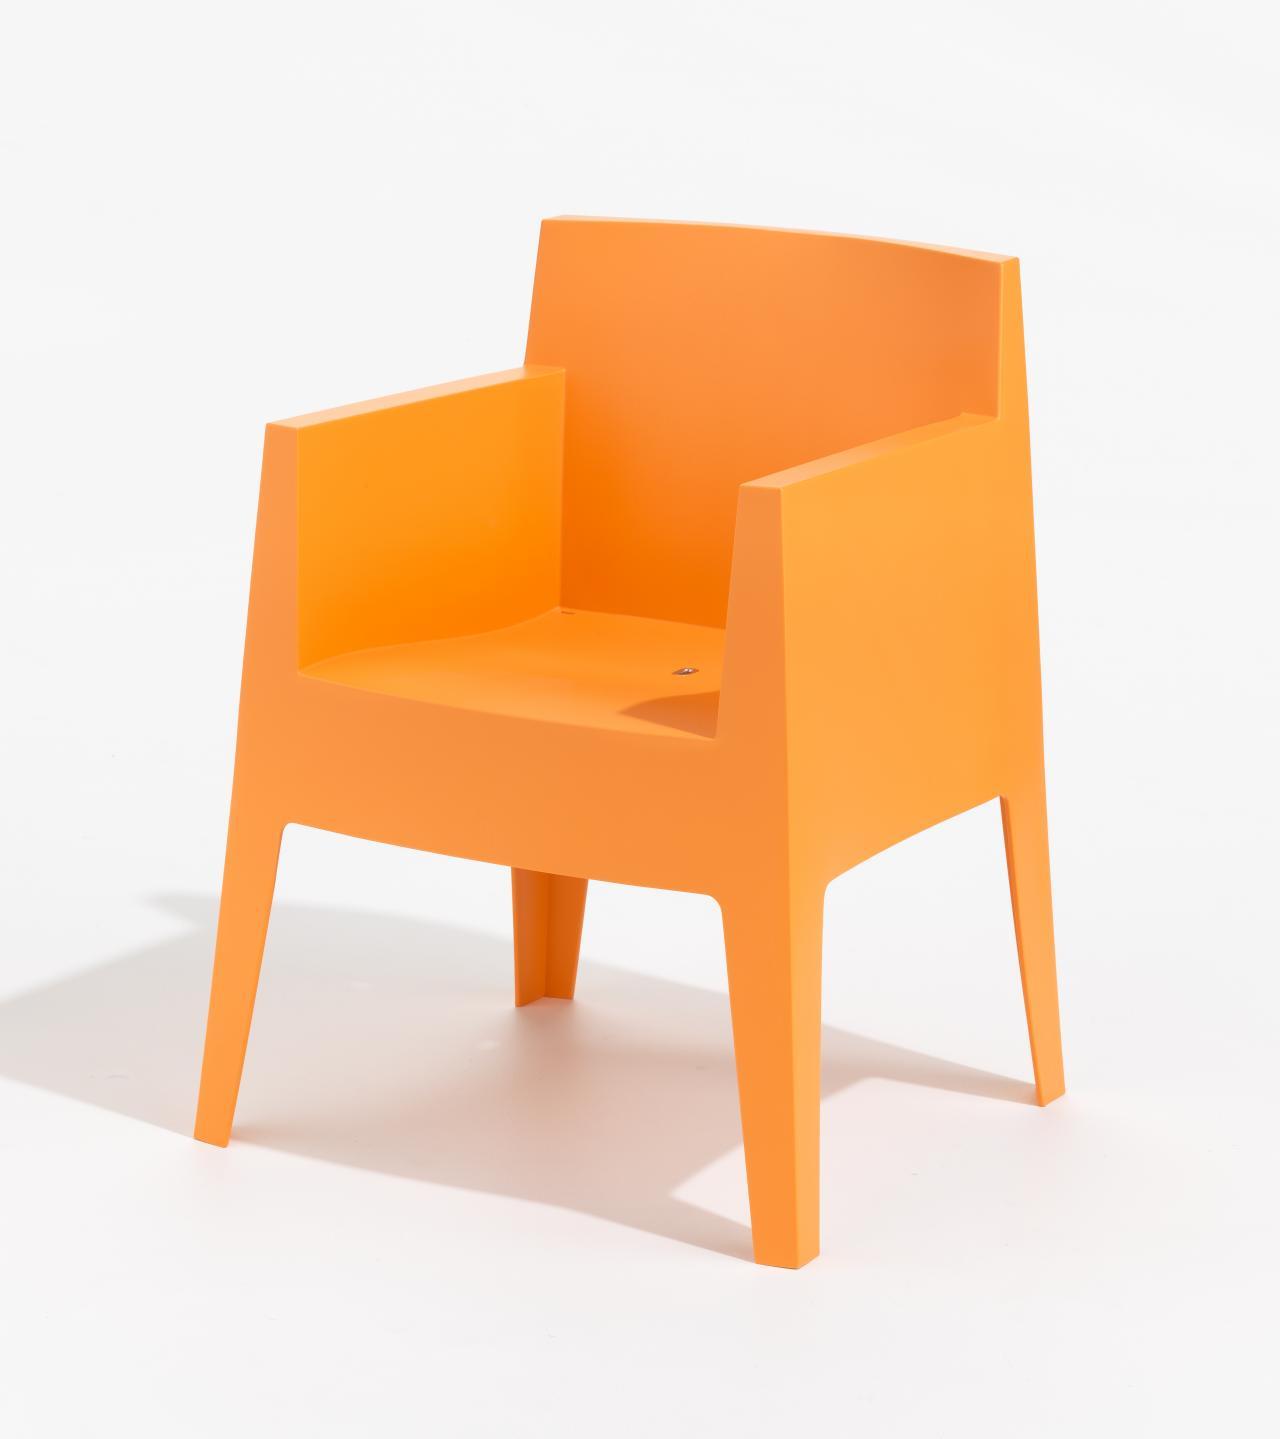 toy armchair orange philippe starck designer driade milan